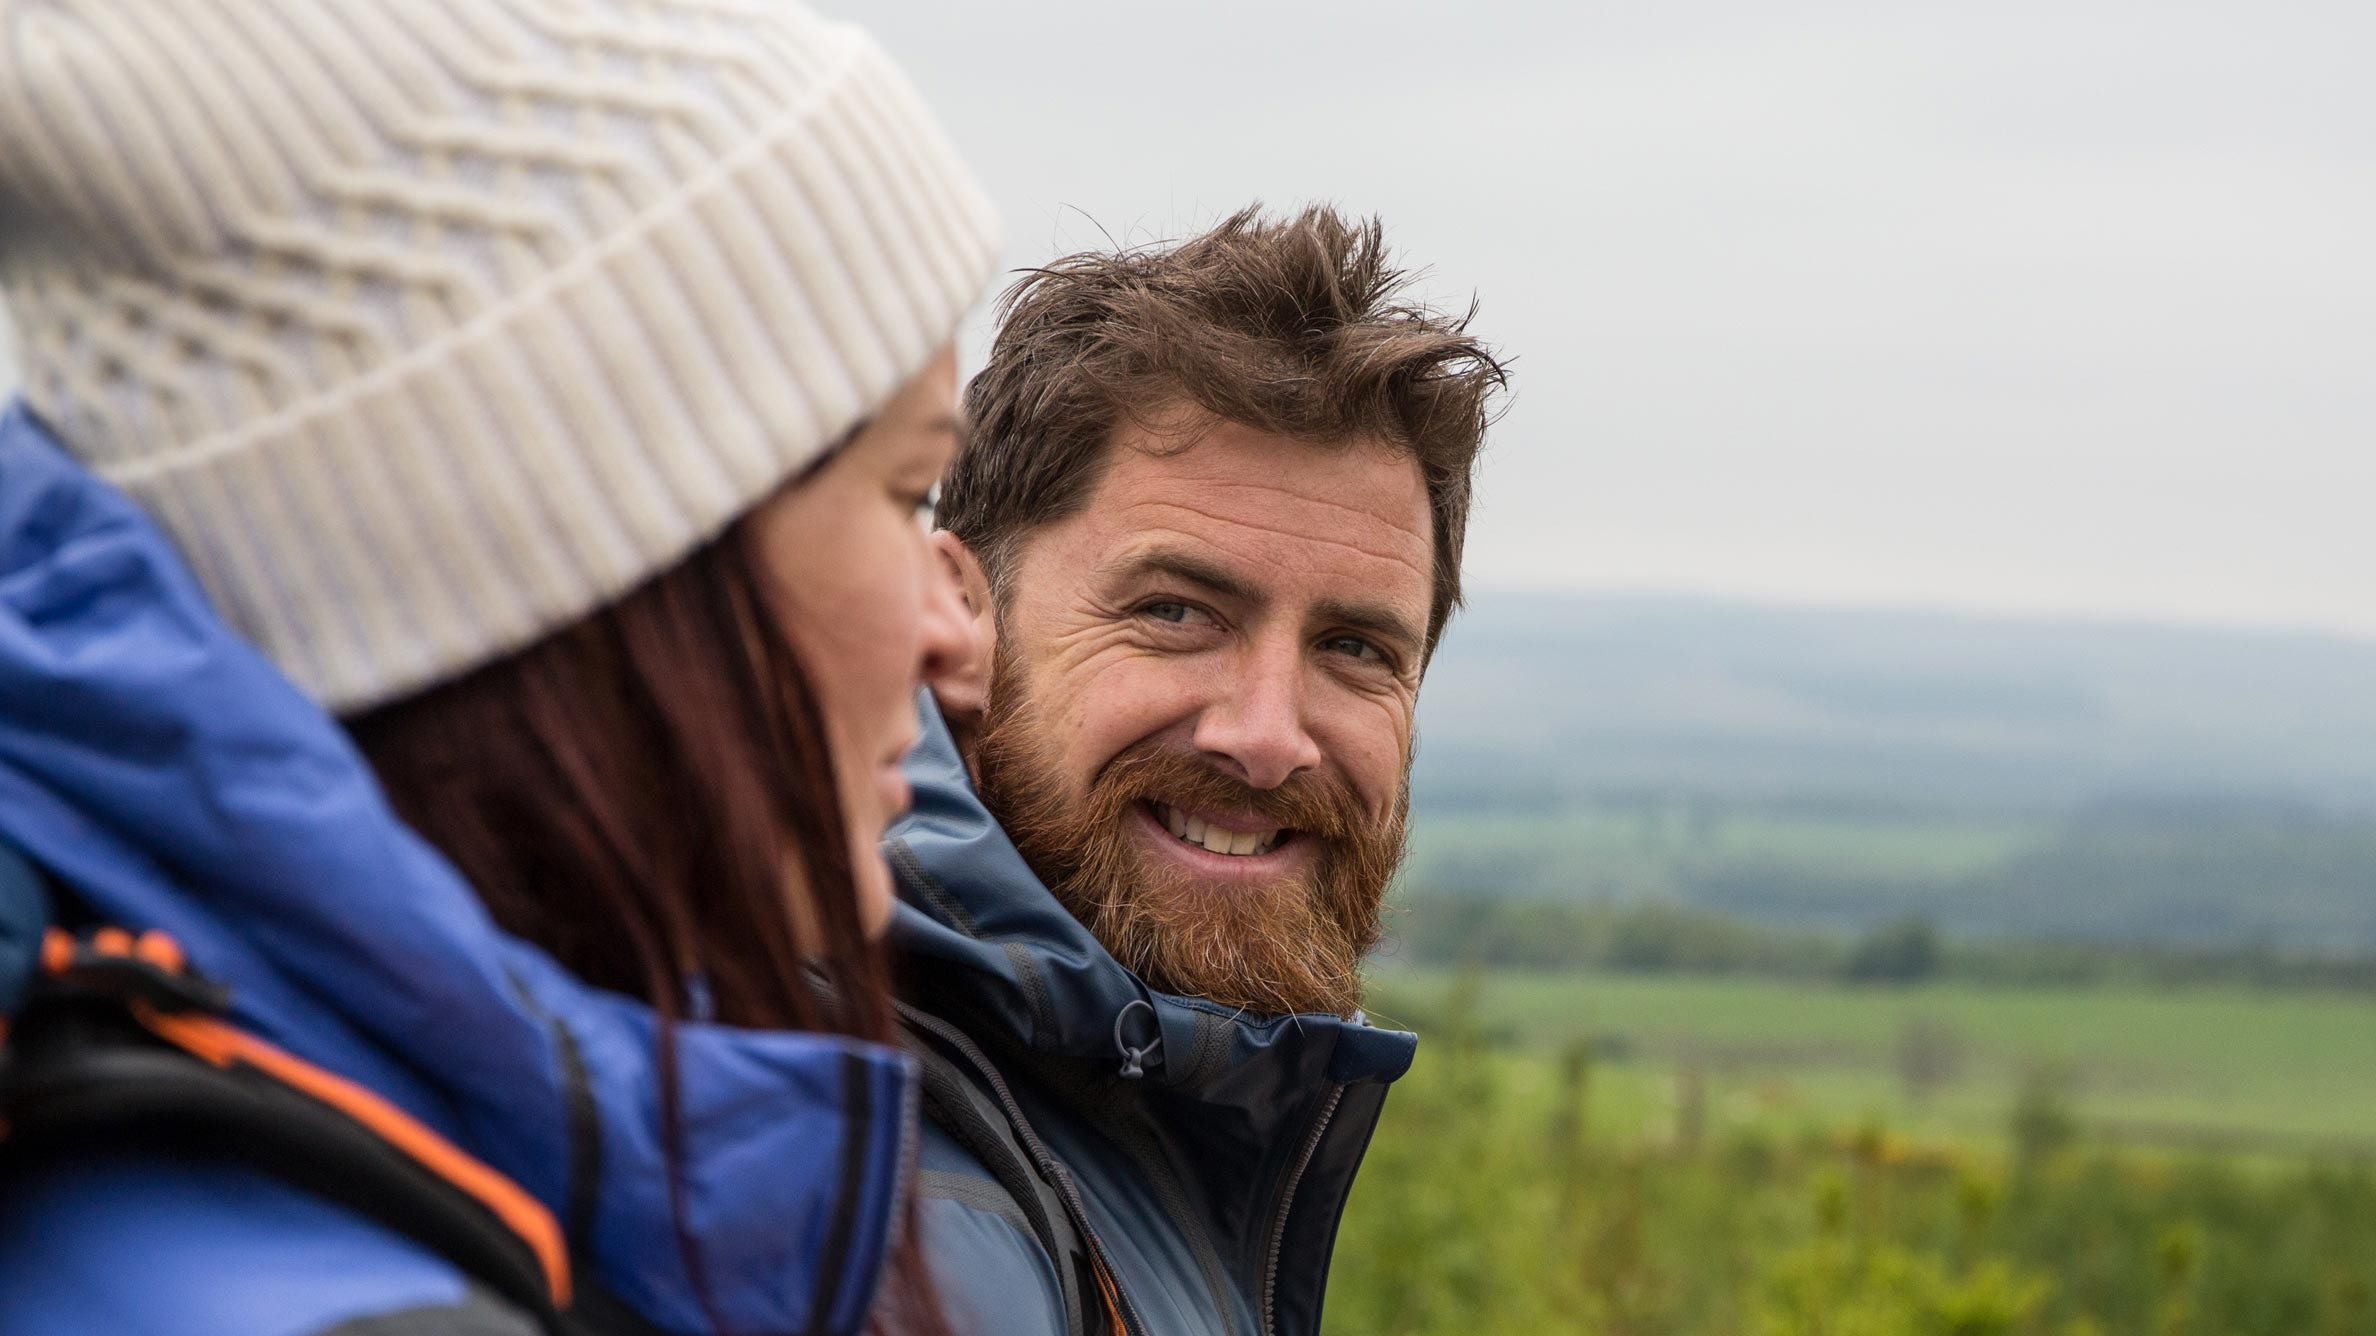 A man and woman wearing Columbia rain jackets.